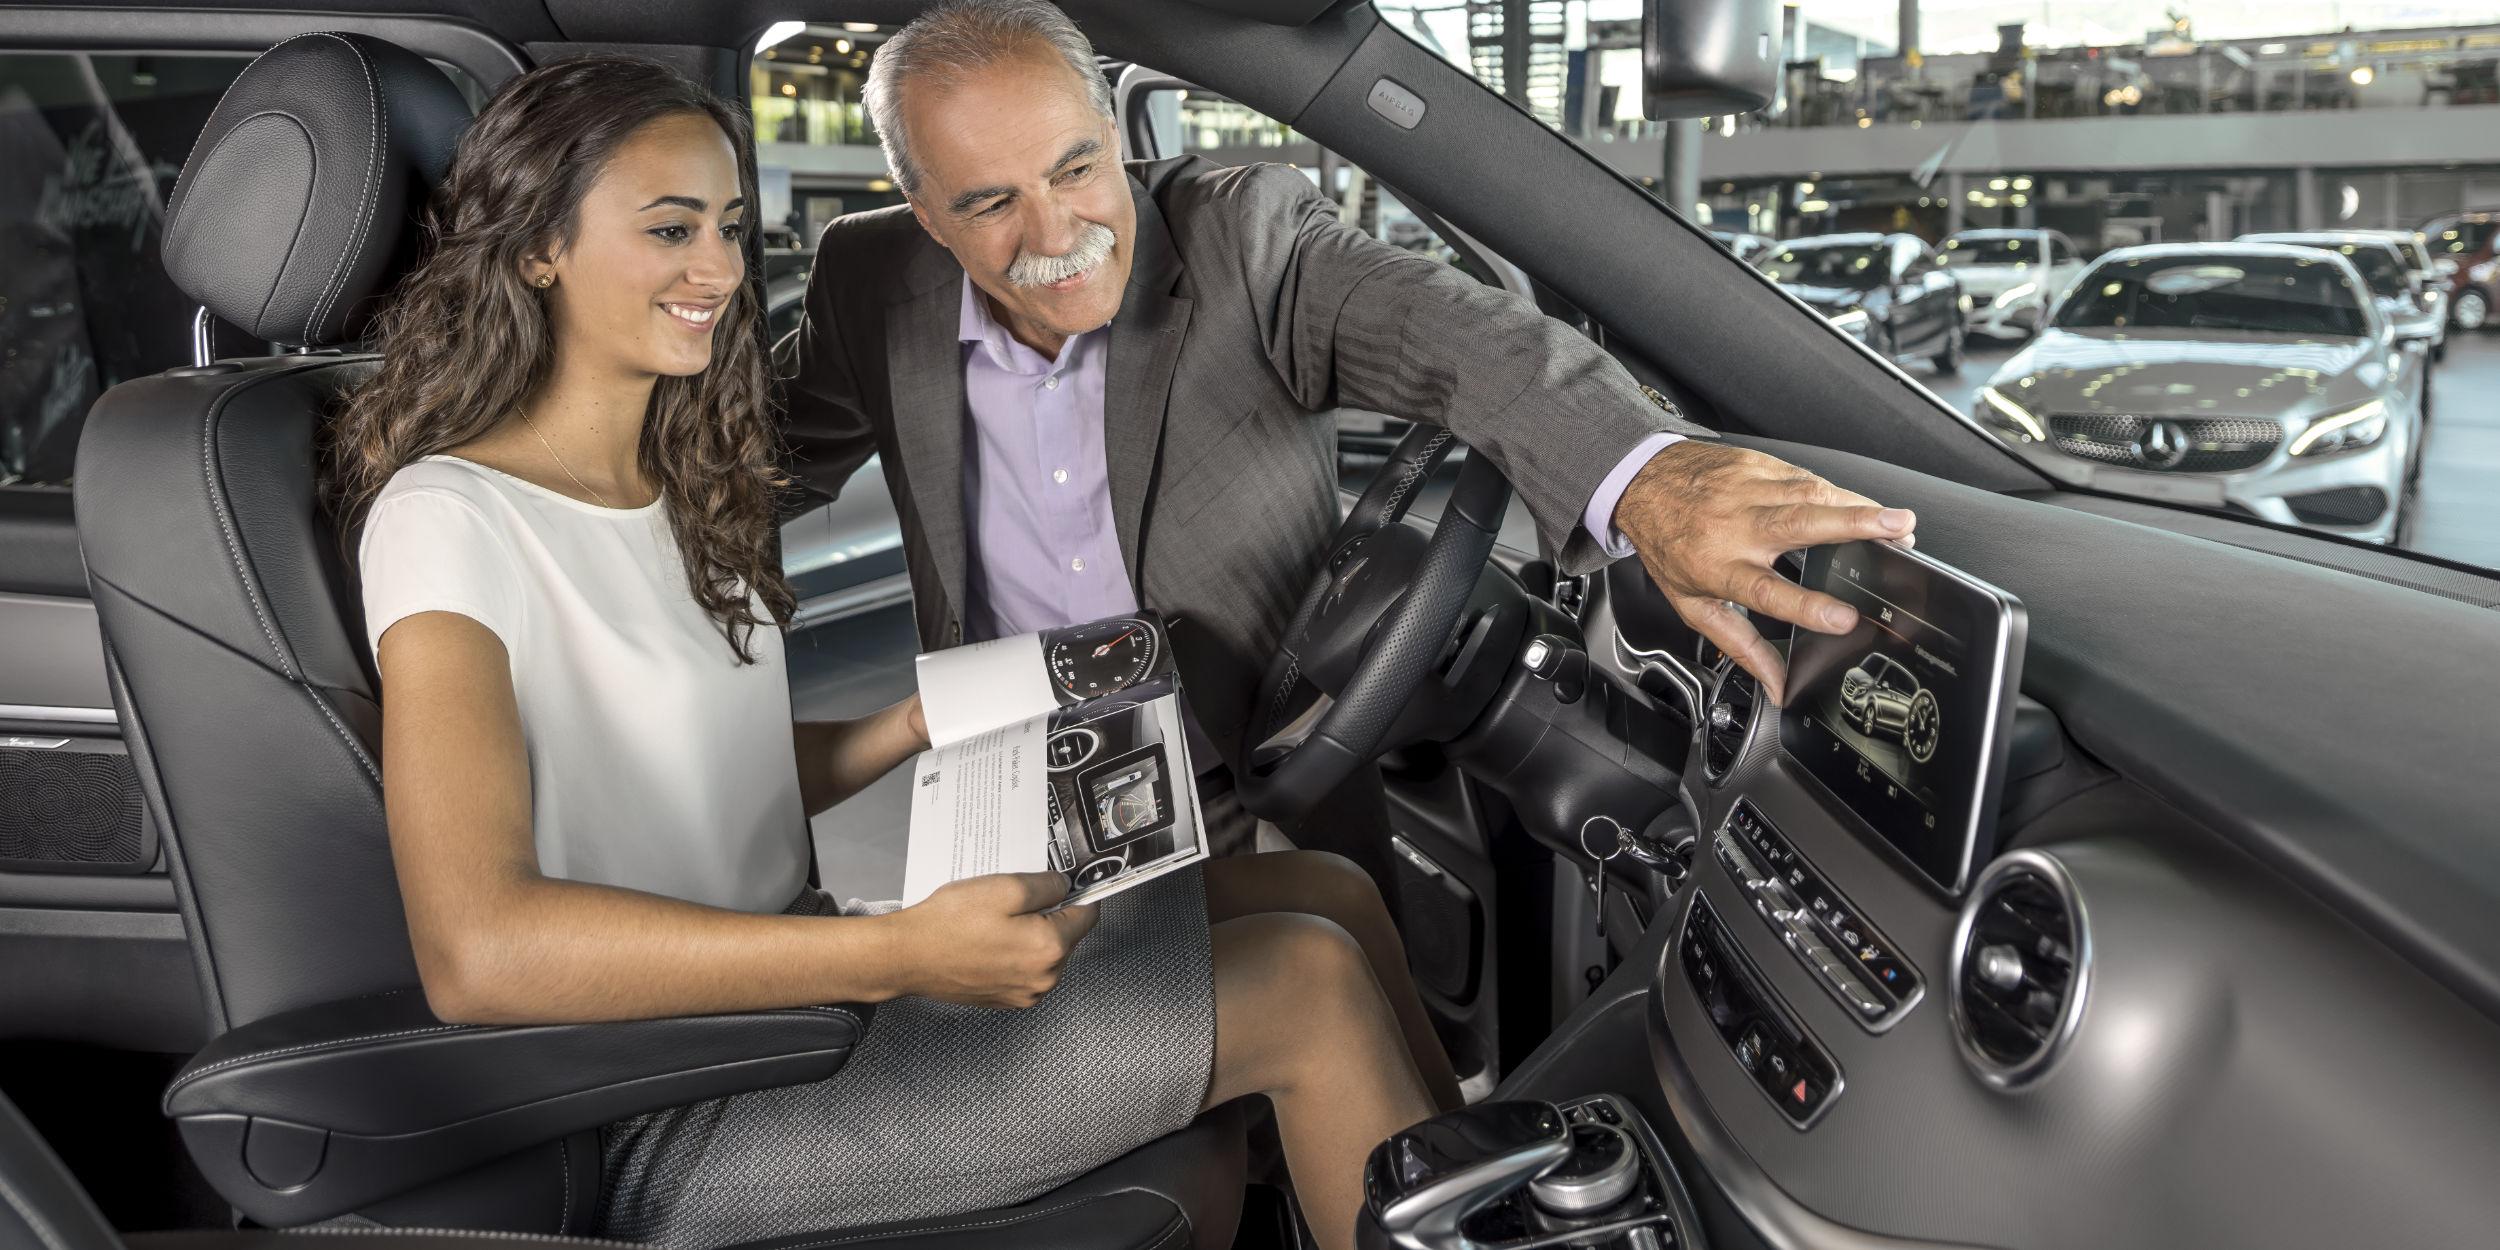 People Fotografie Stuttgart und Umgebung Charakter Portrait Daimler AG Senior Experts Kampagne Untertürkheim